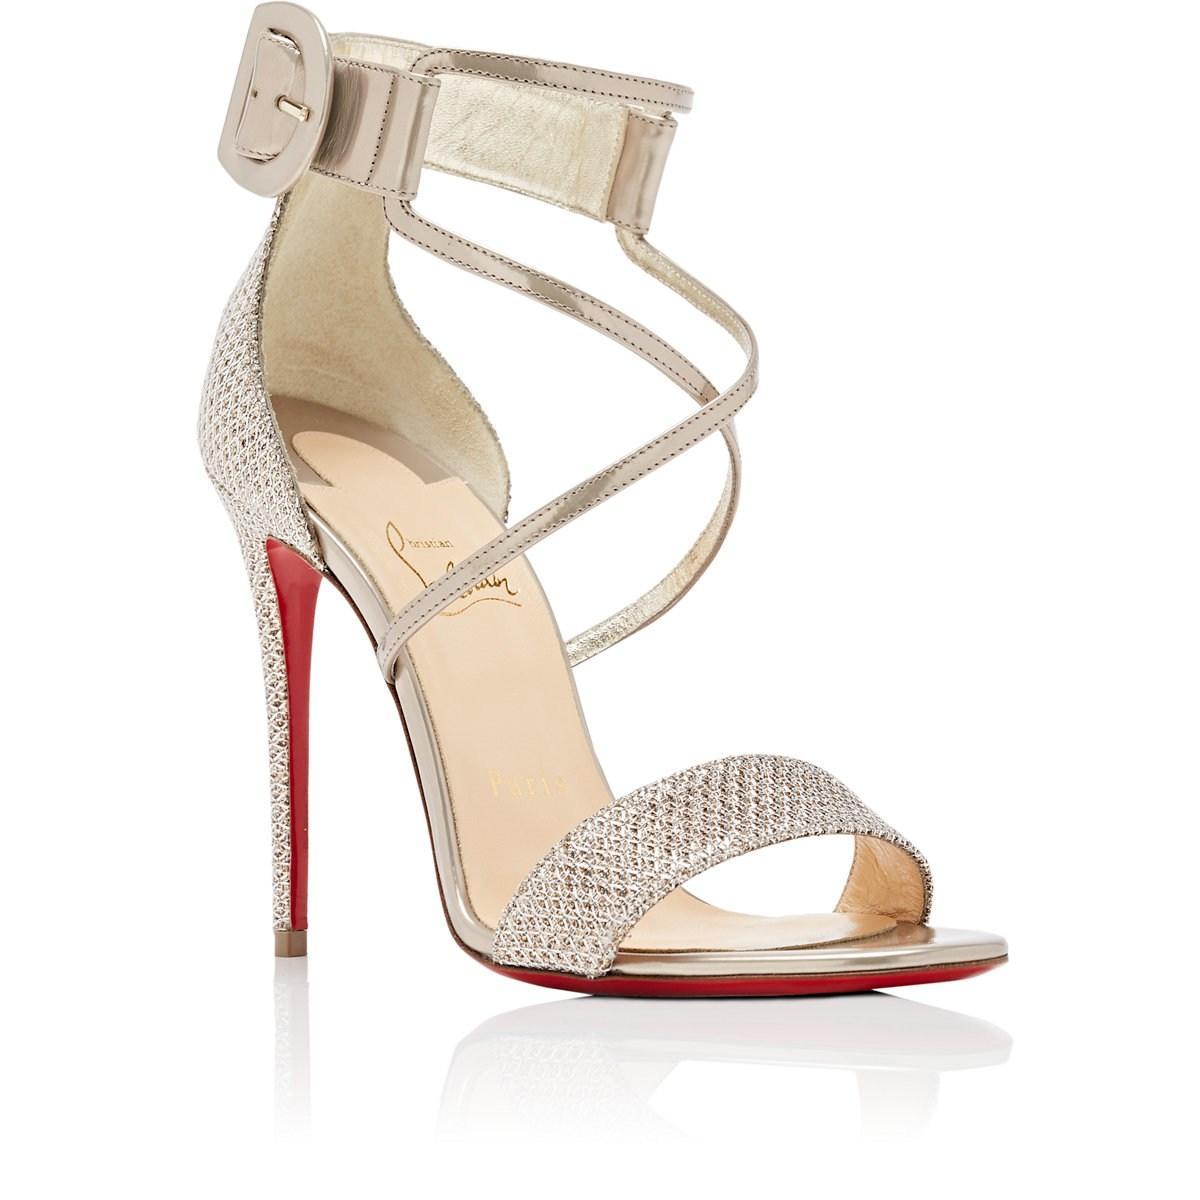 97fc5c434e51a Christian Louboutin Choca Specchio Leather   Mesh Sandals in ...